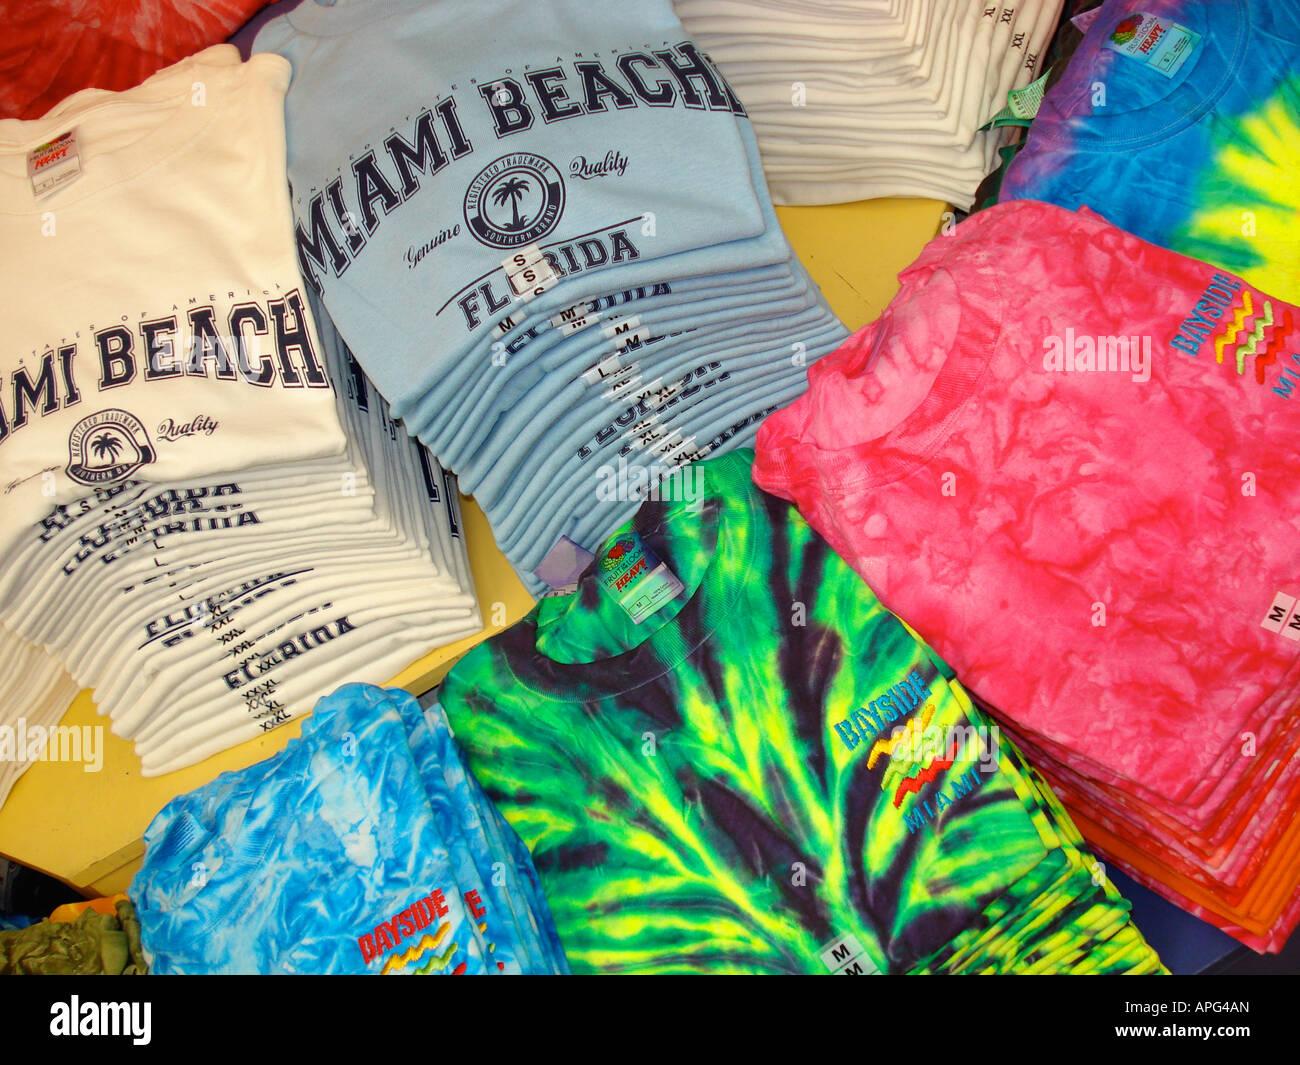 Tee shirts at Bayside Market, Miami, Florida - Stock Image